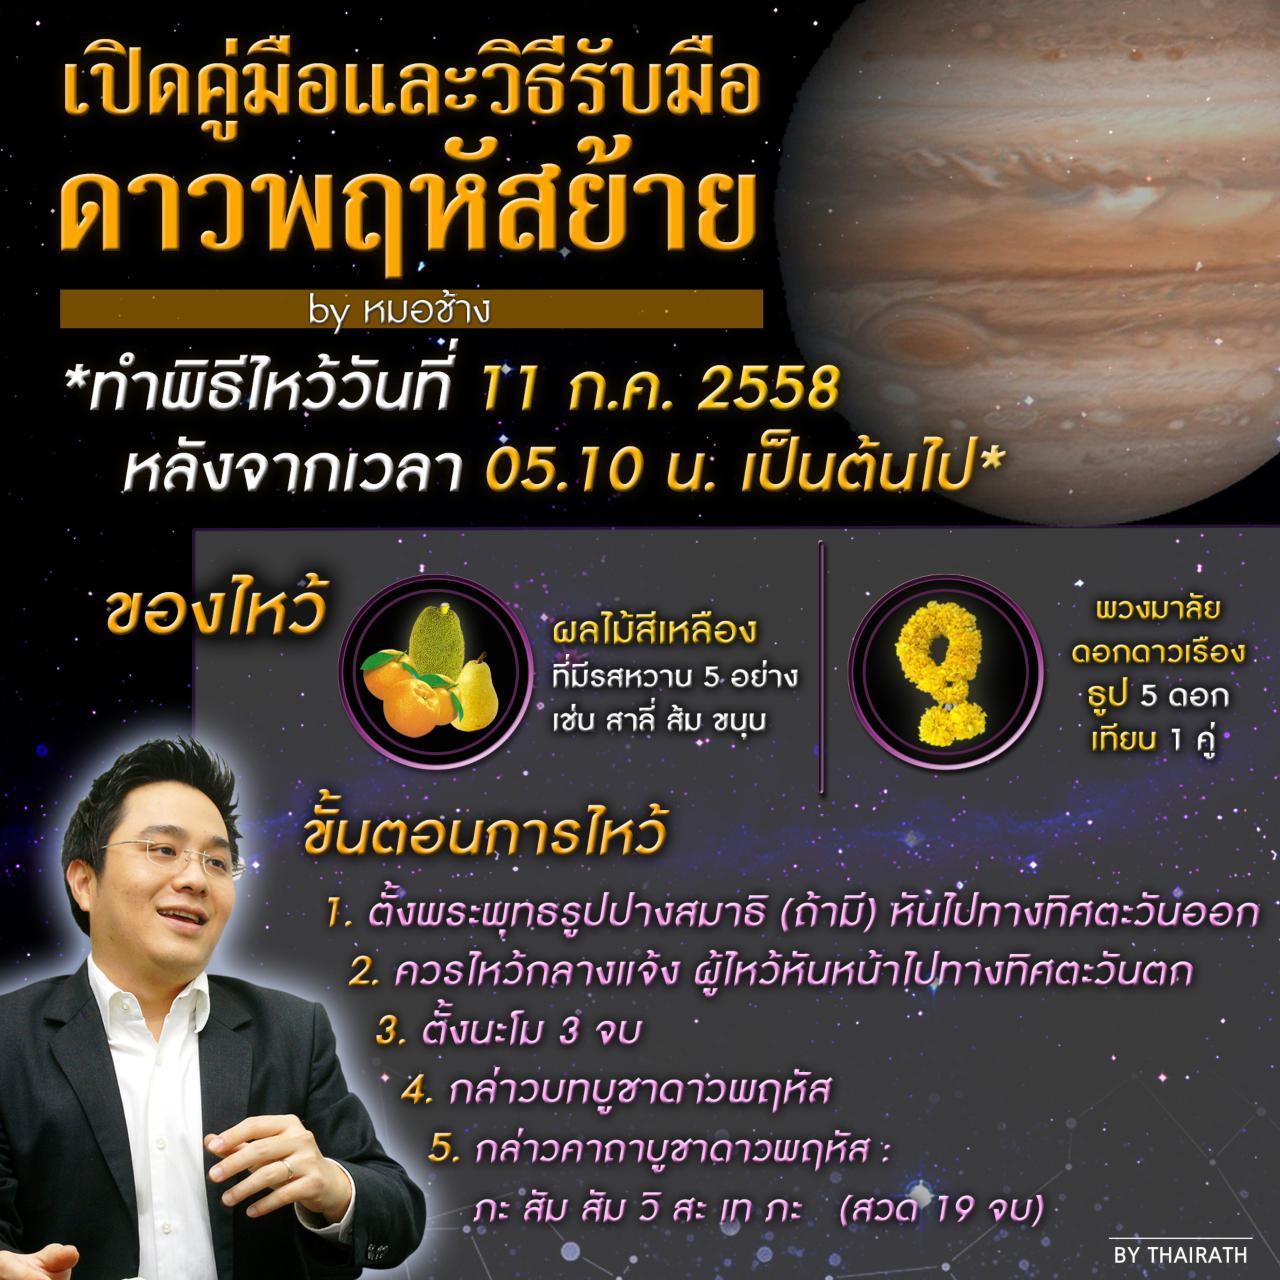 "Thairath_News on Twitter: ""11 ก.ค.นี้ ดาวพฤหัสย้ายใหญ่ ..."